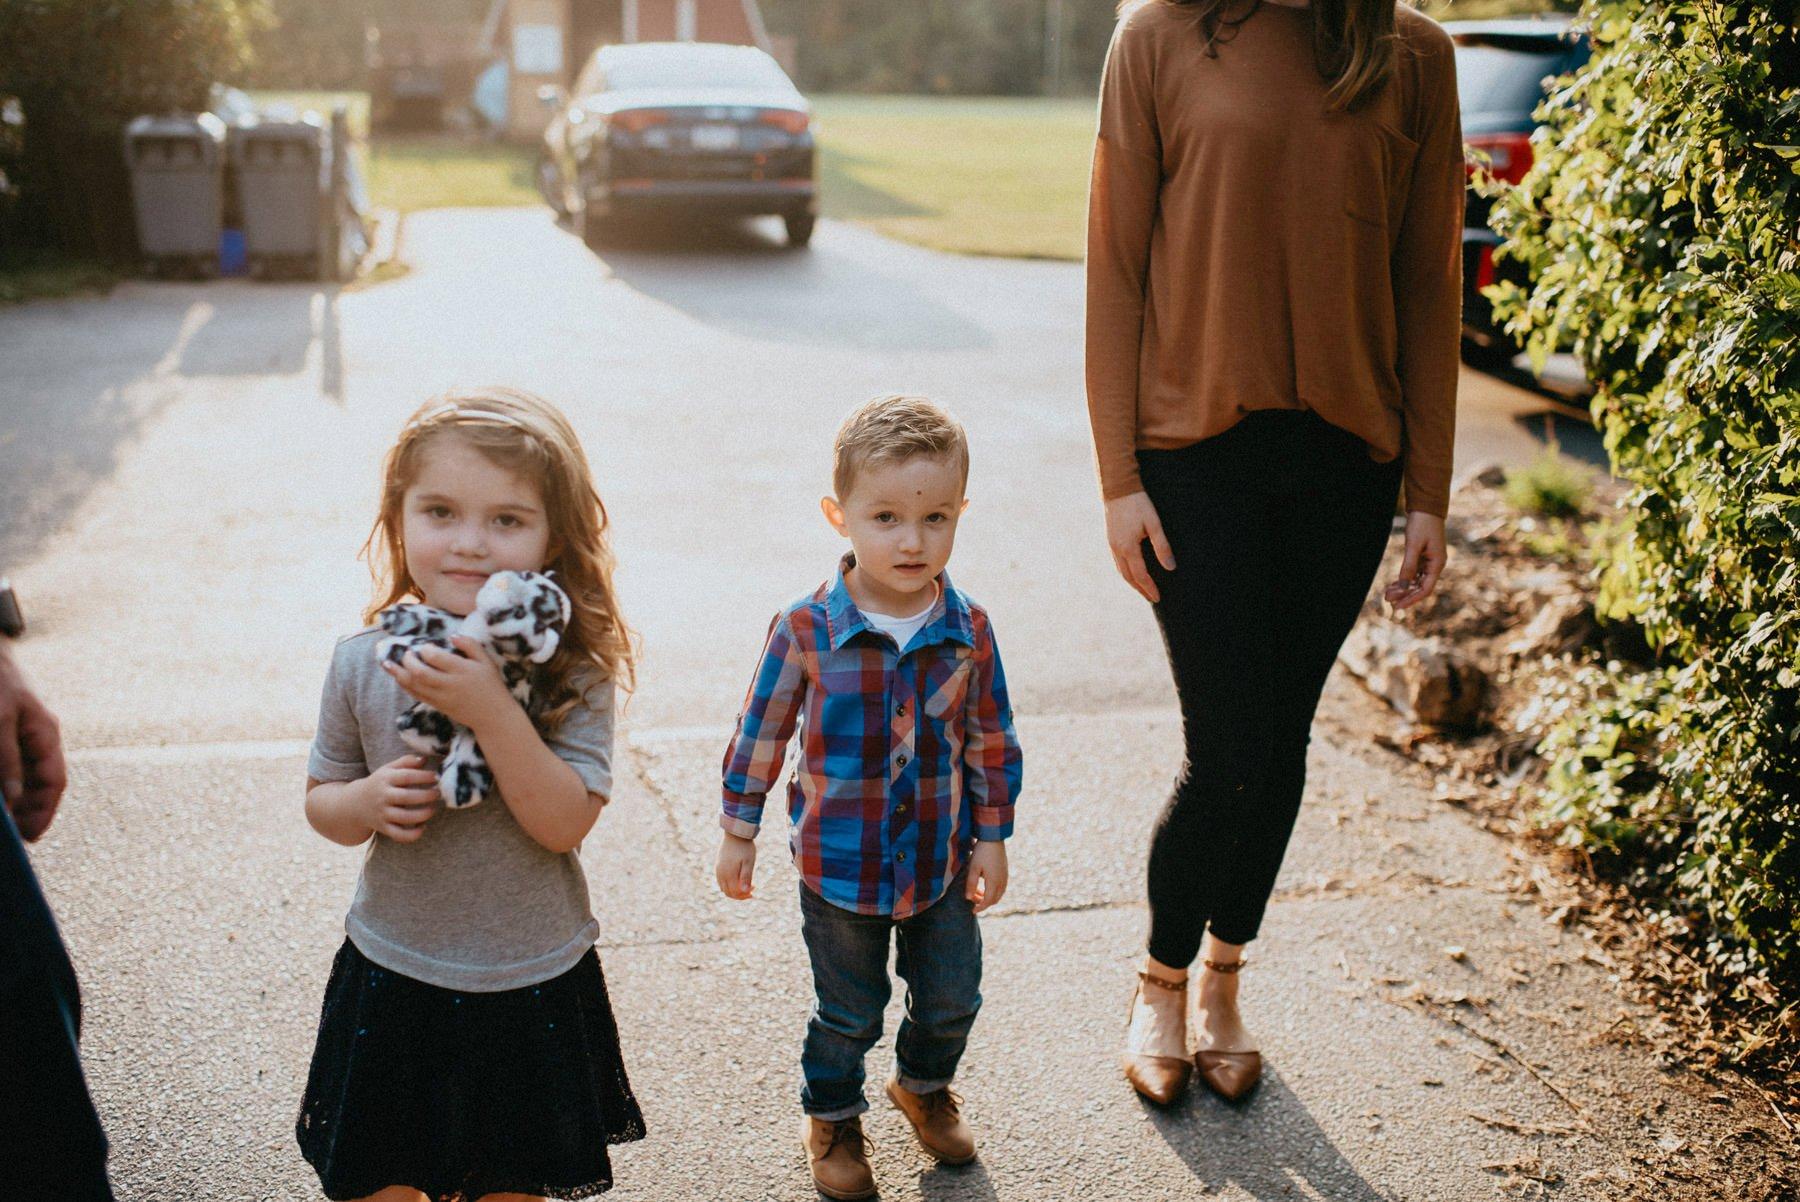 delware-pennsylvania-family-photographer-43.jpg